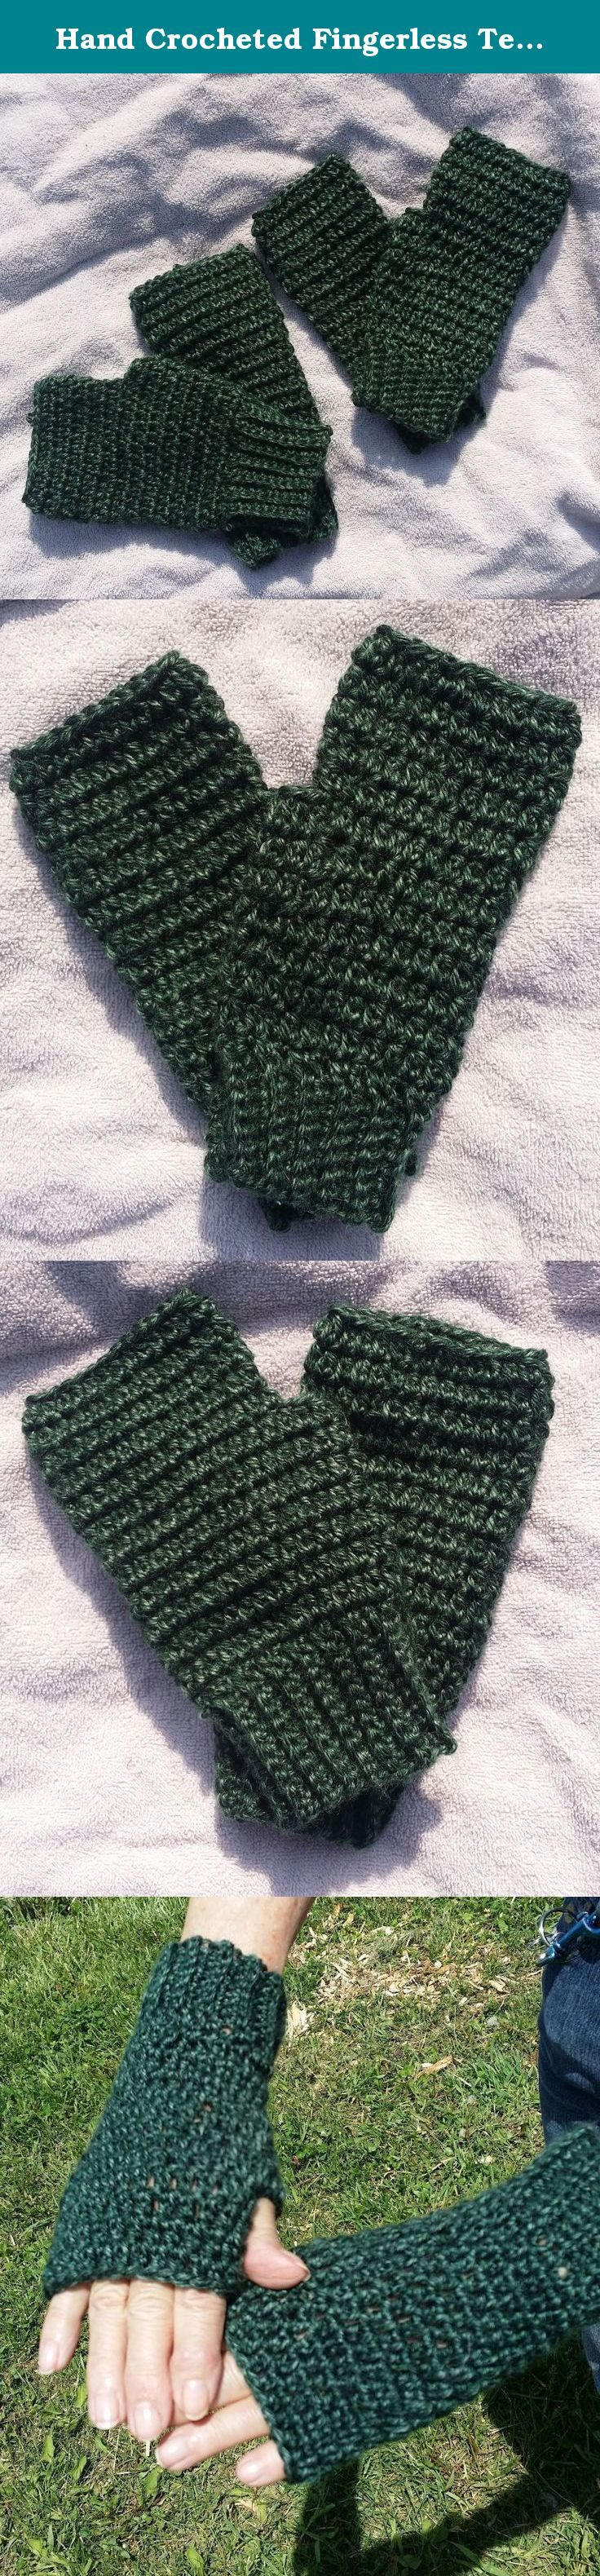 Fingerless gloves eso - Hand Crocheted Fingerless Texting Gloves Arthritis Hand Warmers Deep Forest Green These Gloves